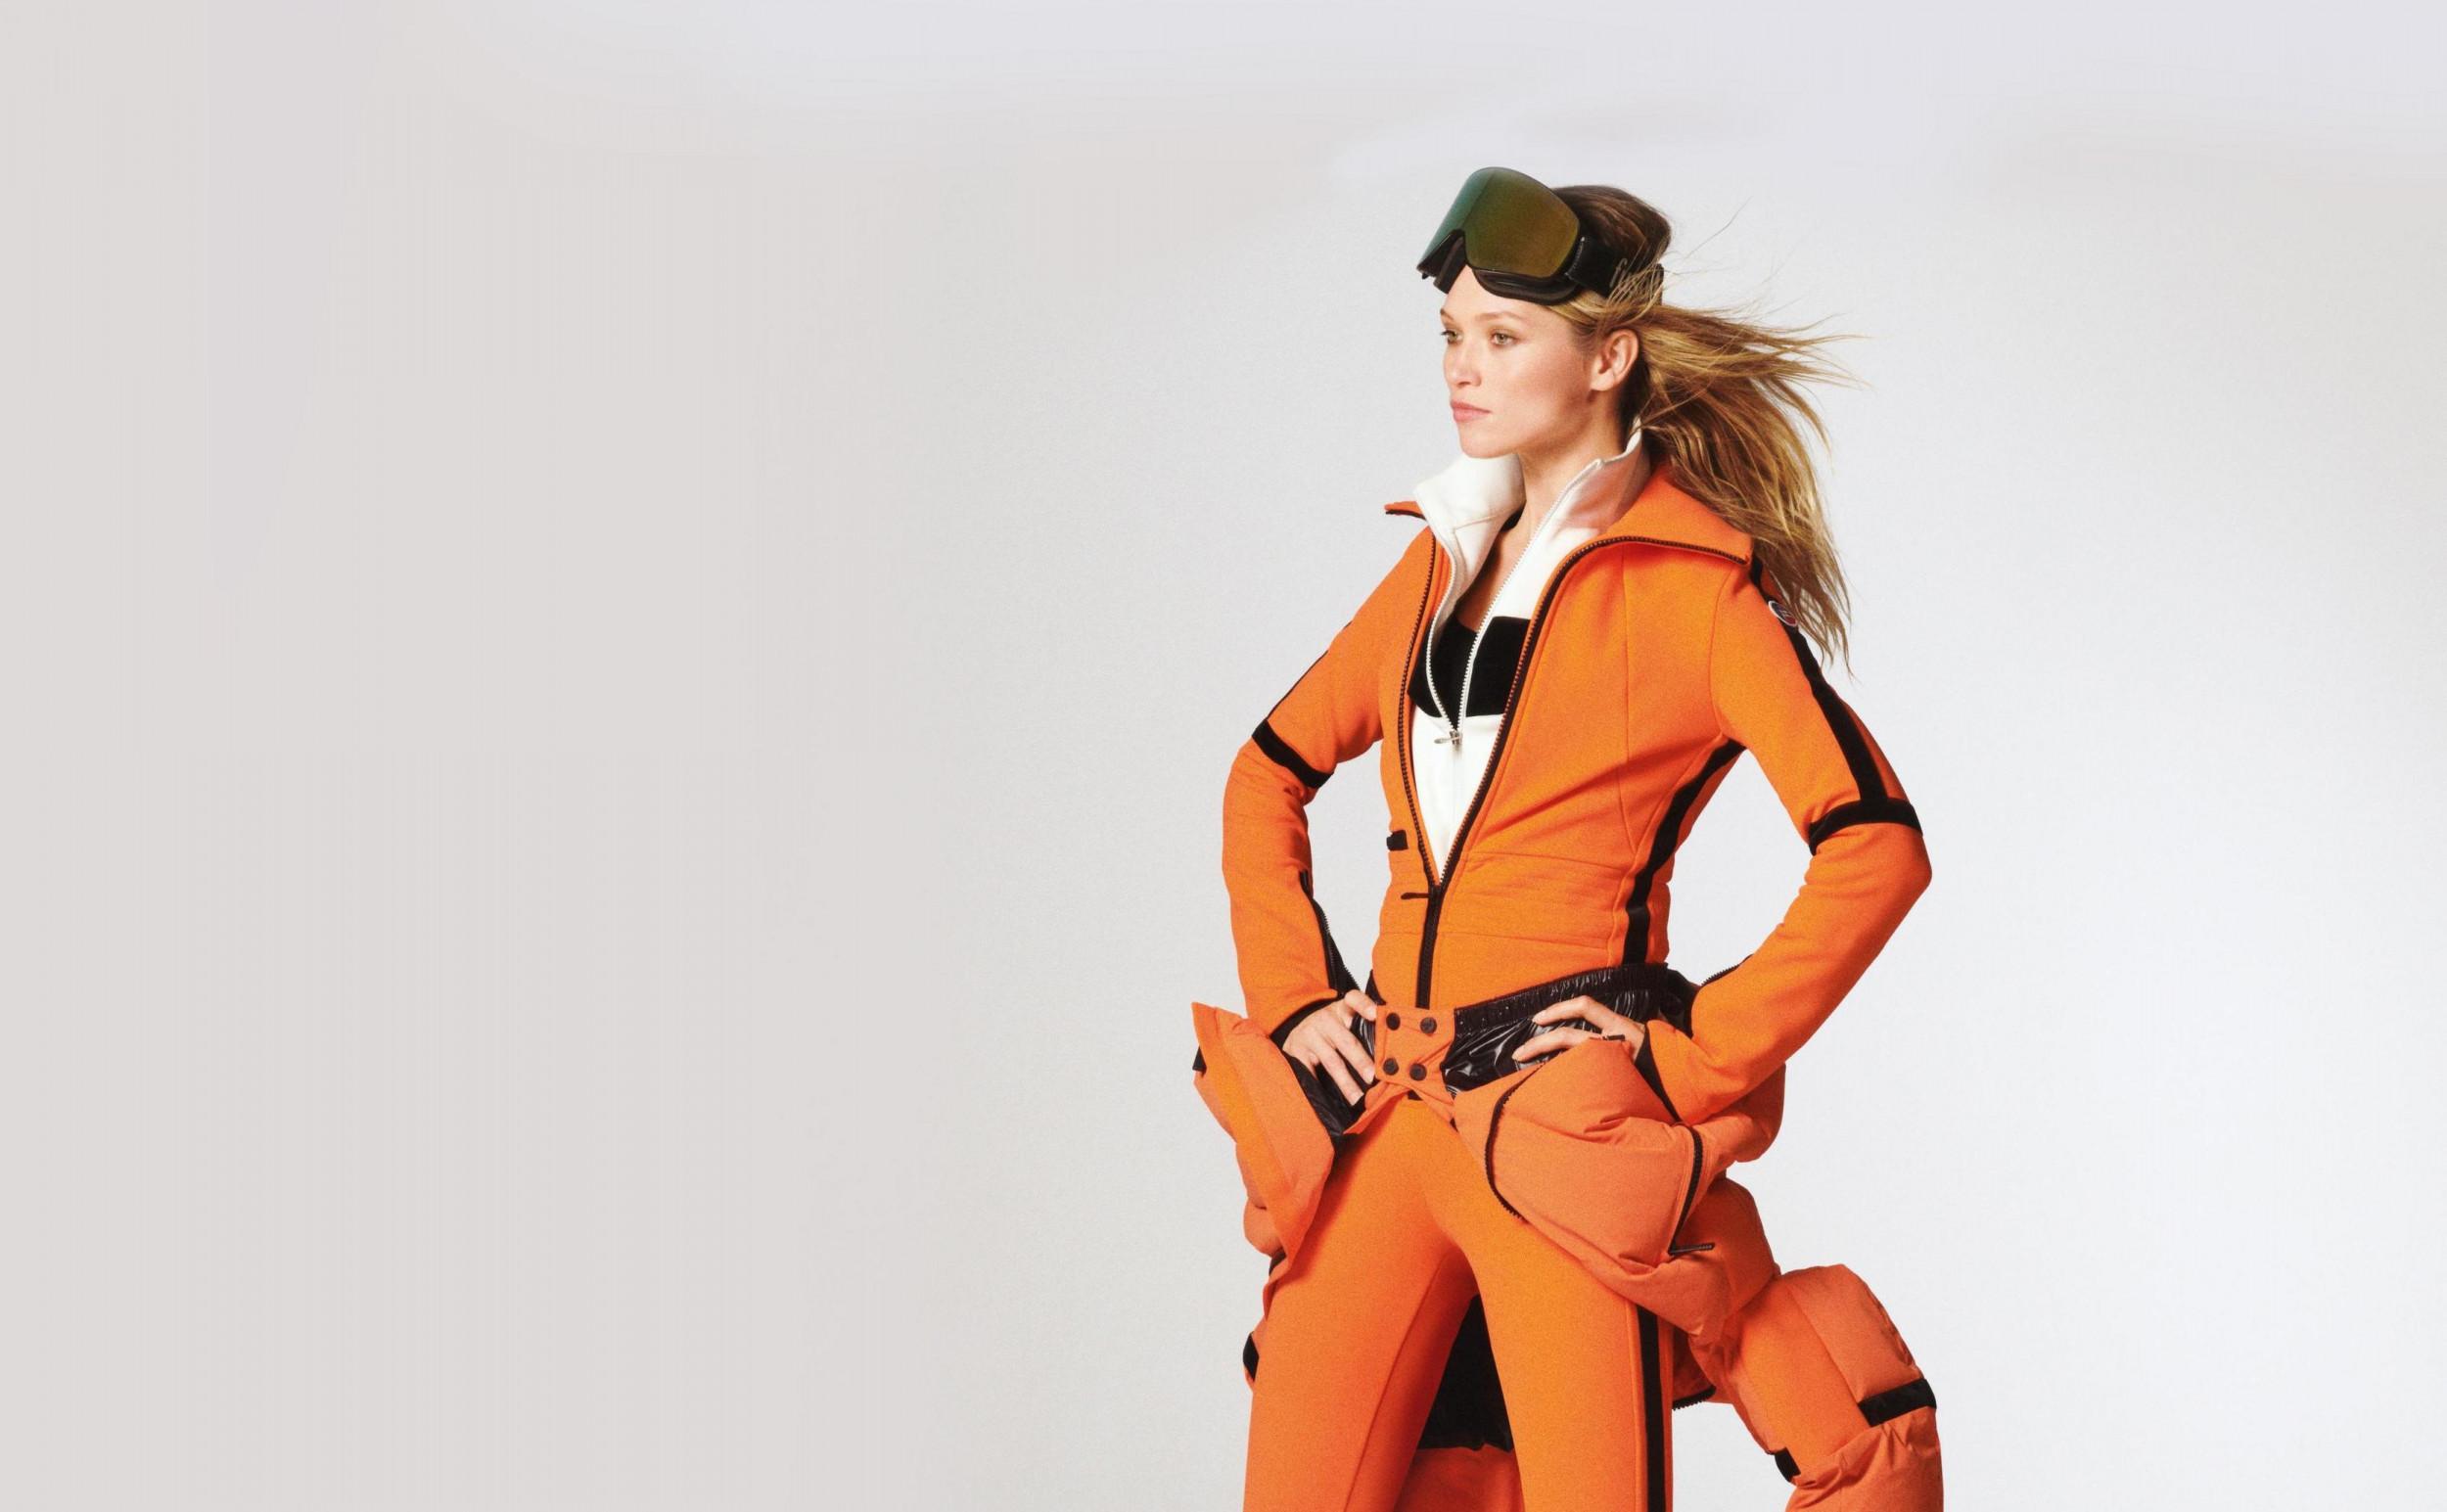 Modern ski outfit